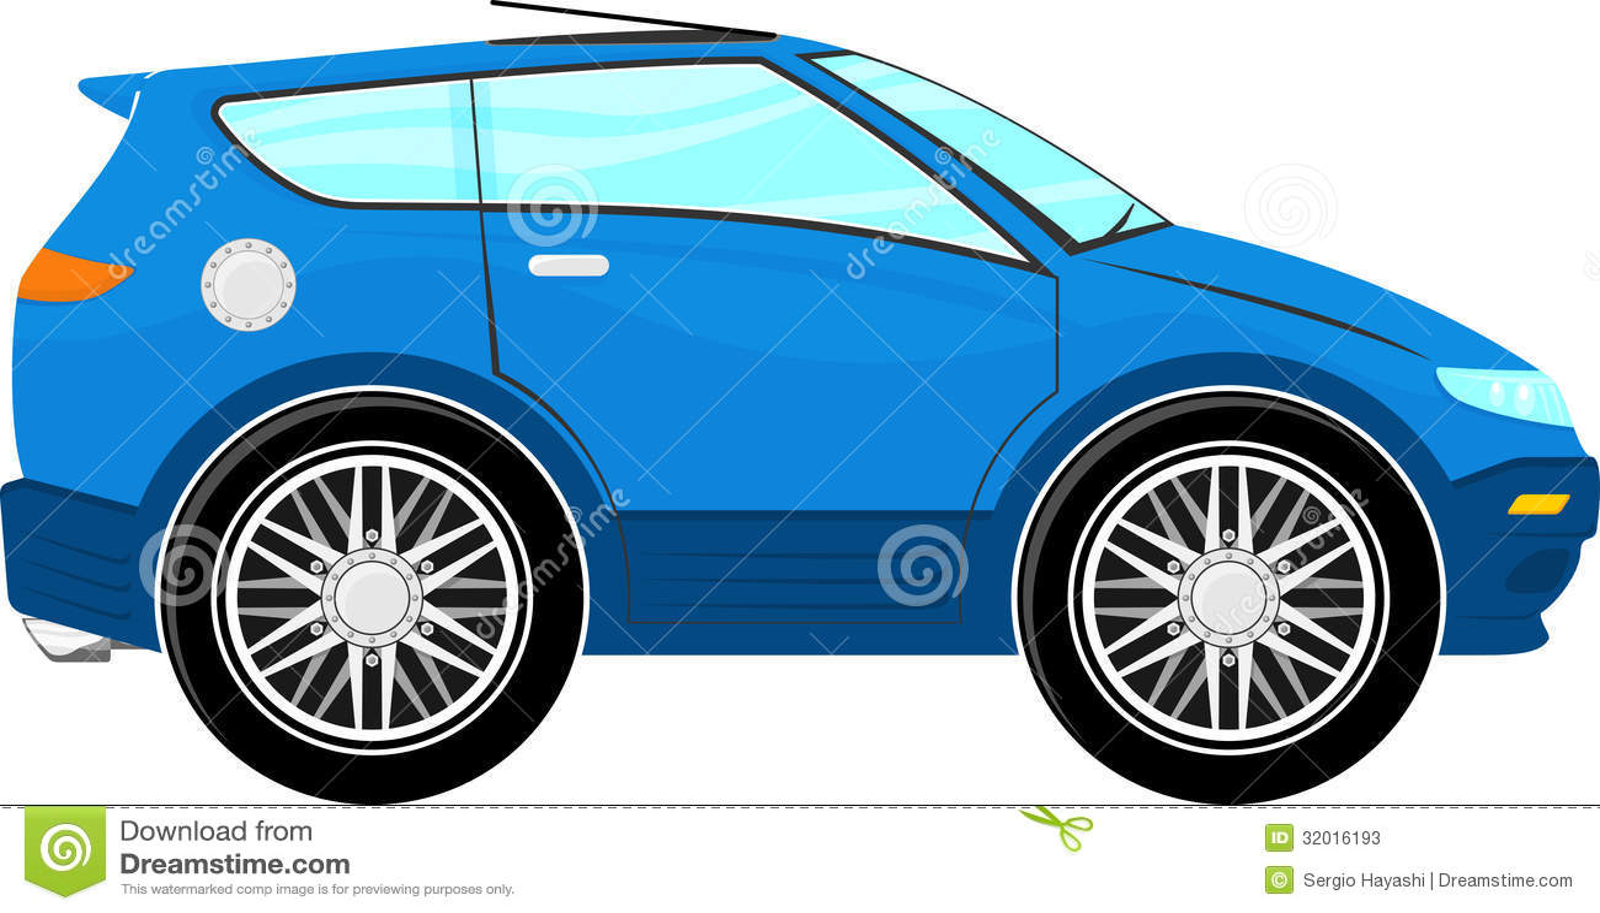 Funny Blue Car Cartoon Stock Photos Image 32016193